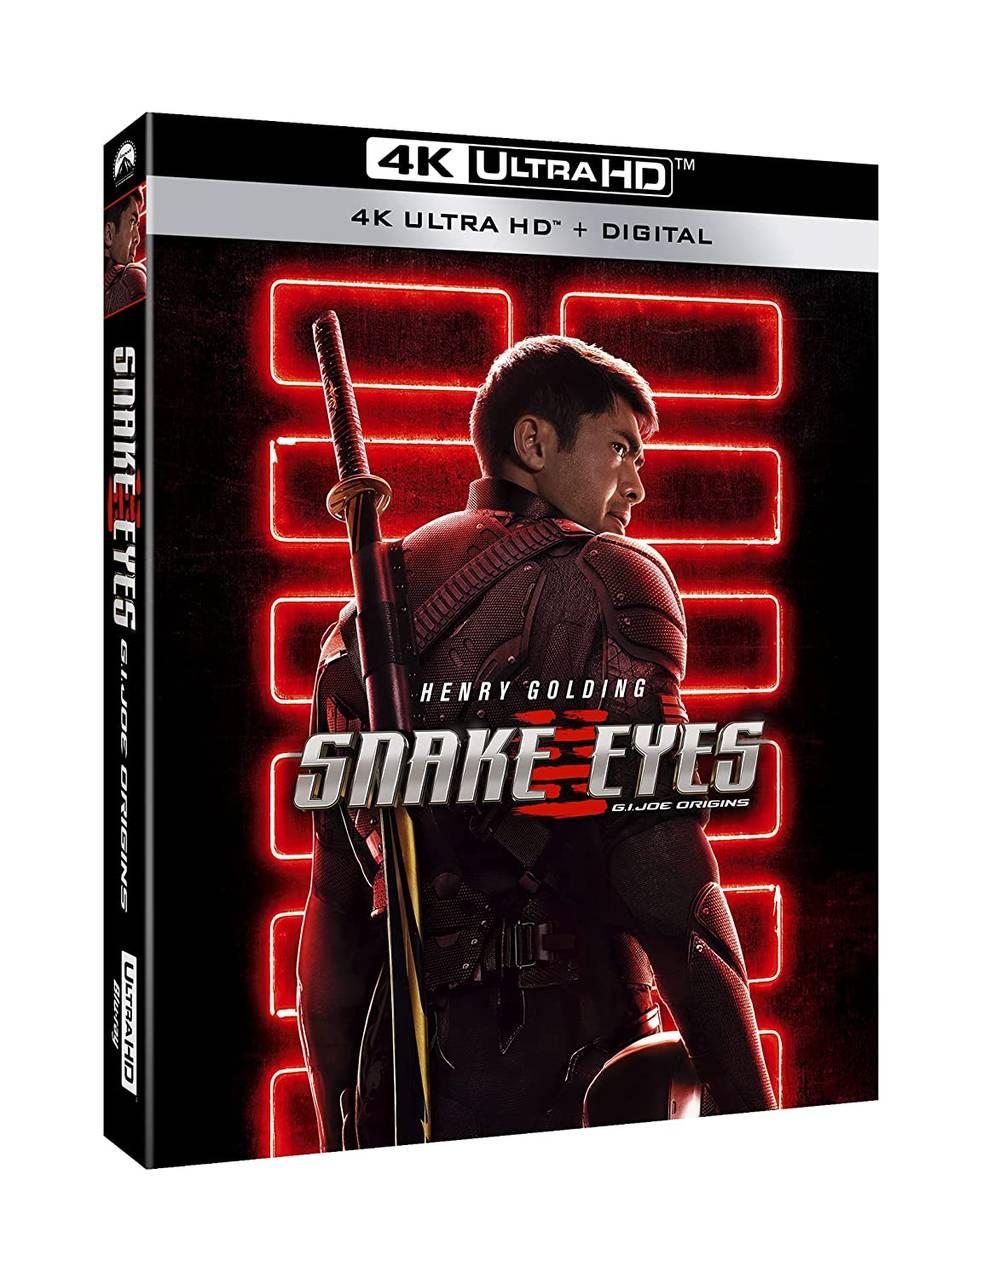 G.I. Joe - Snake Eyes: G.I. Joe Origins [4K]